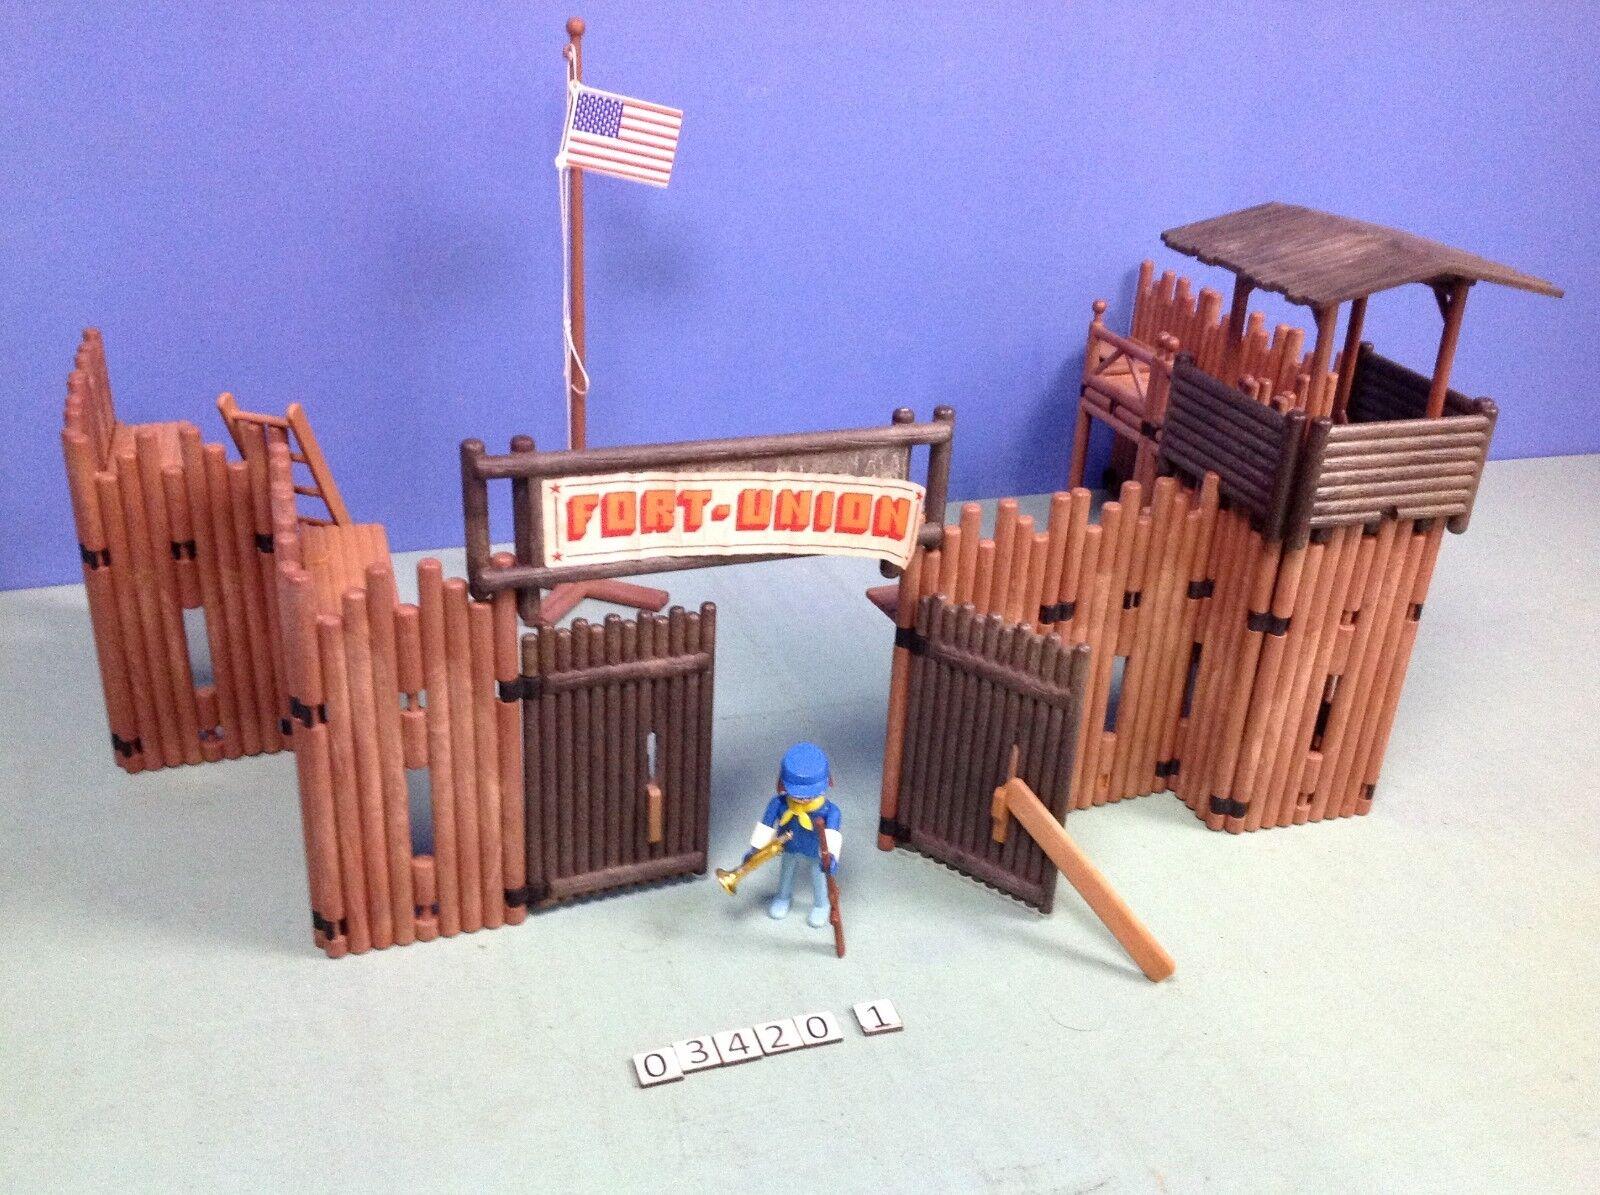 (O3420.1) (O3420.1) (O3420.1) Playmobil Fort Union western ref 3420 klicky année 76 - 81 8209ca